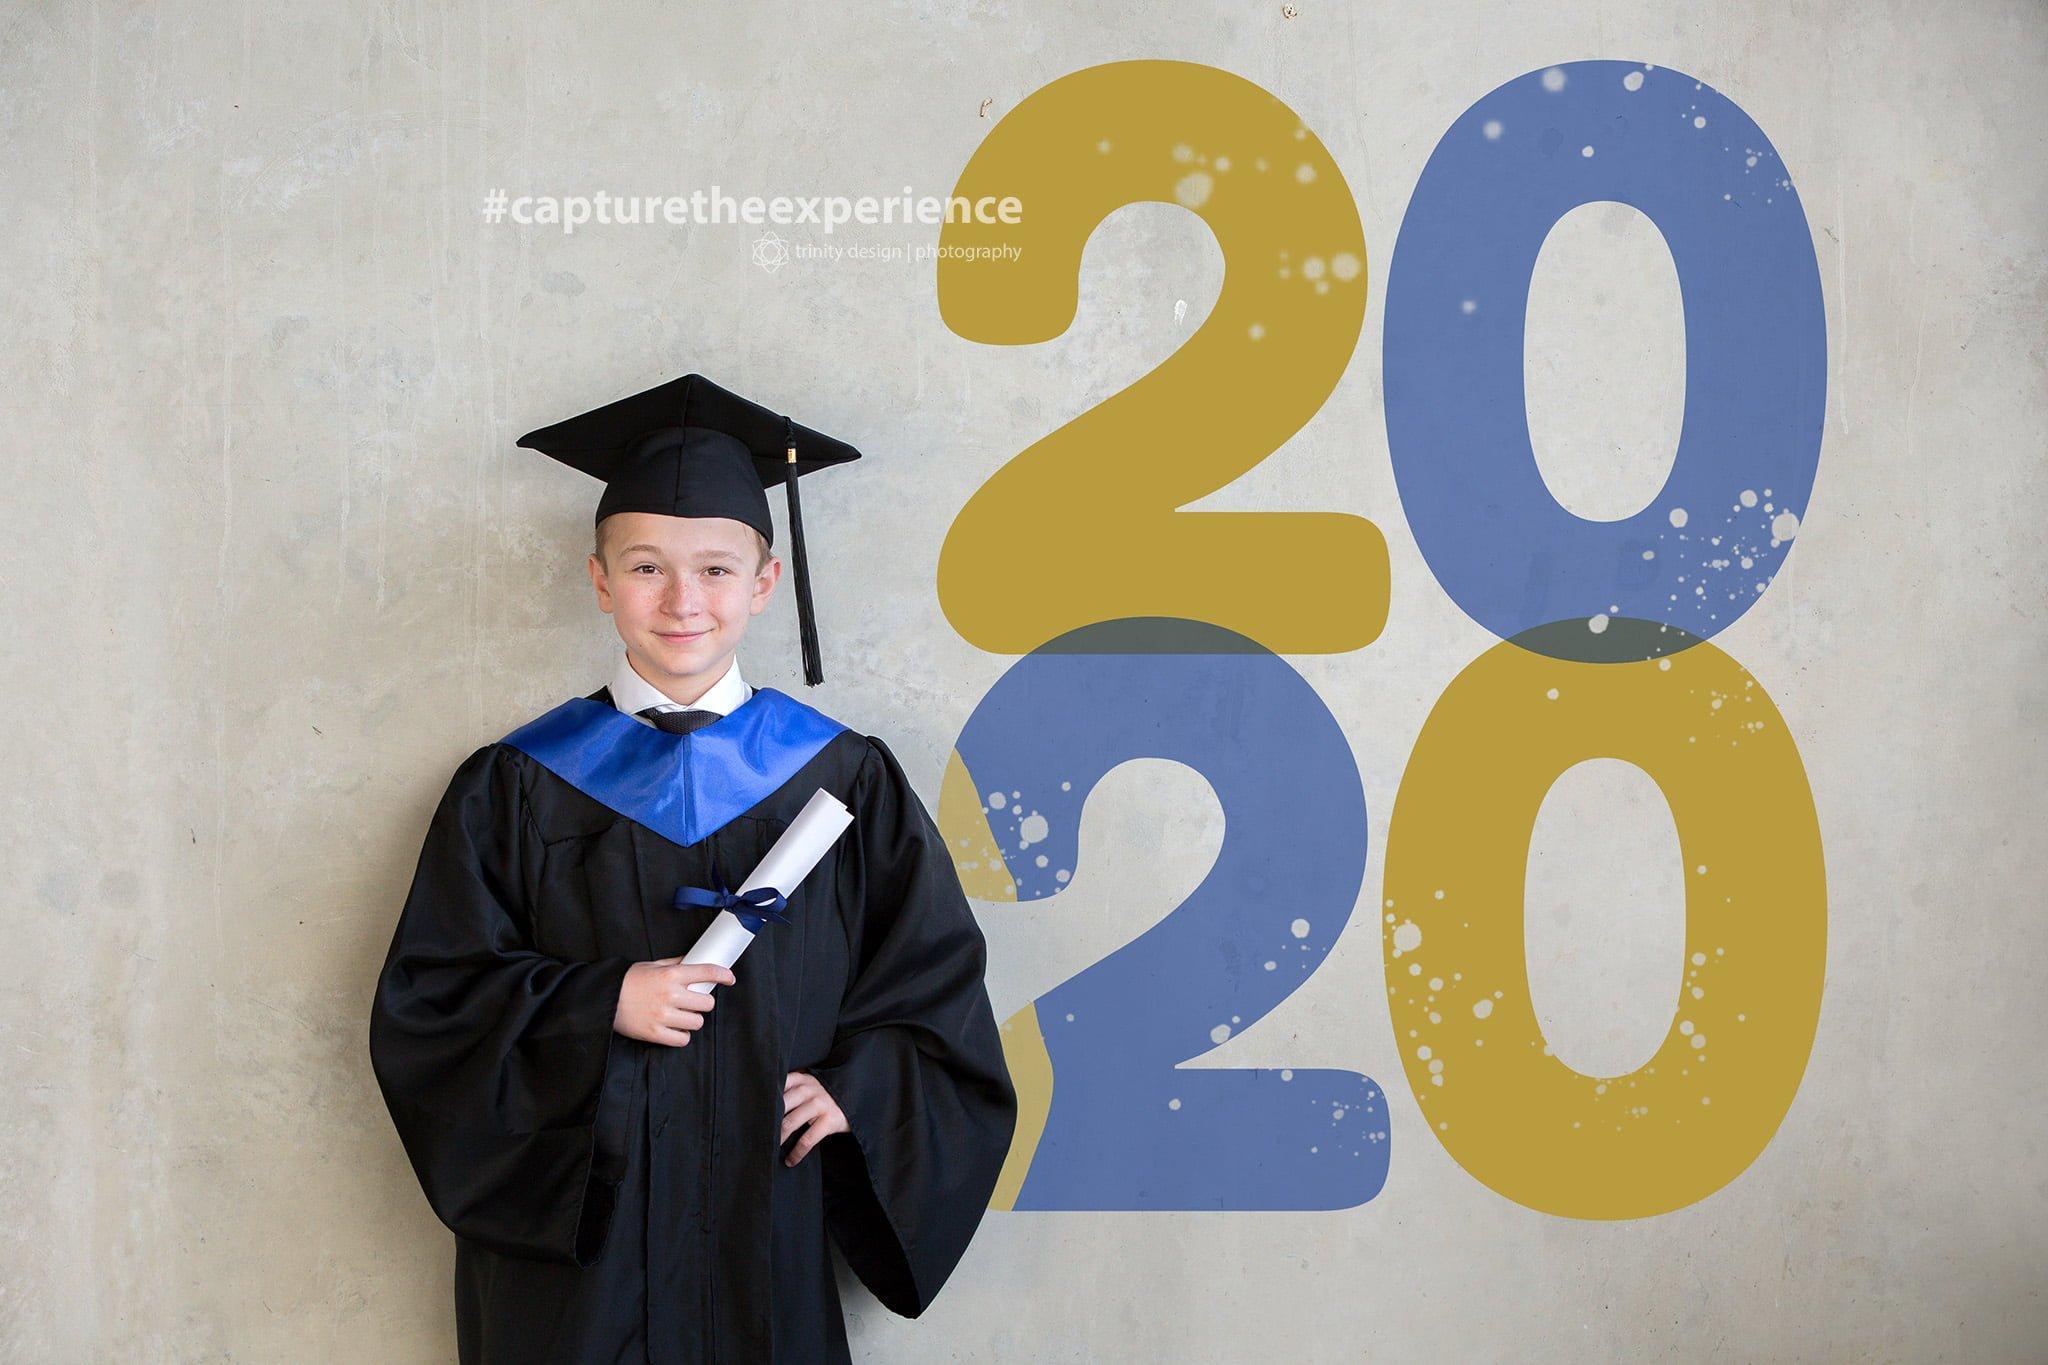 durham-region-graduate-whitby-brooklin